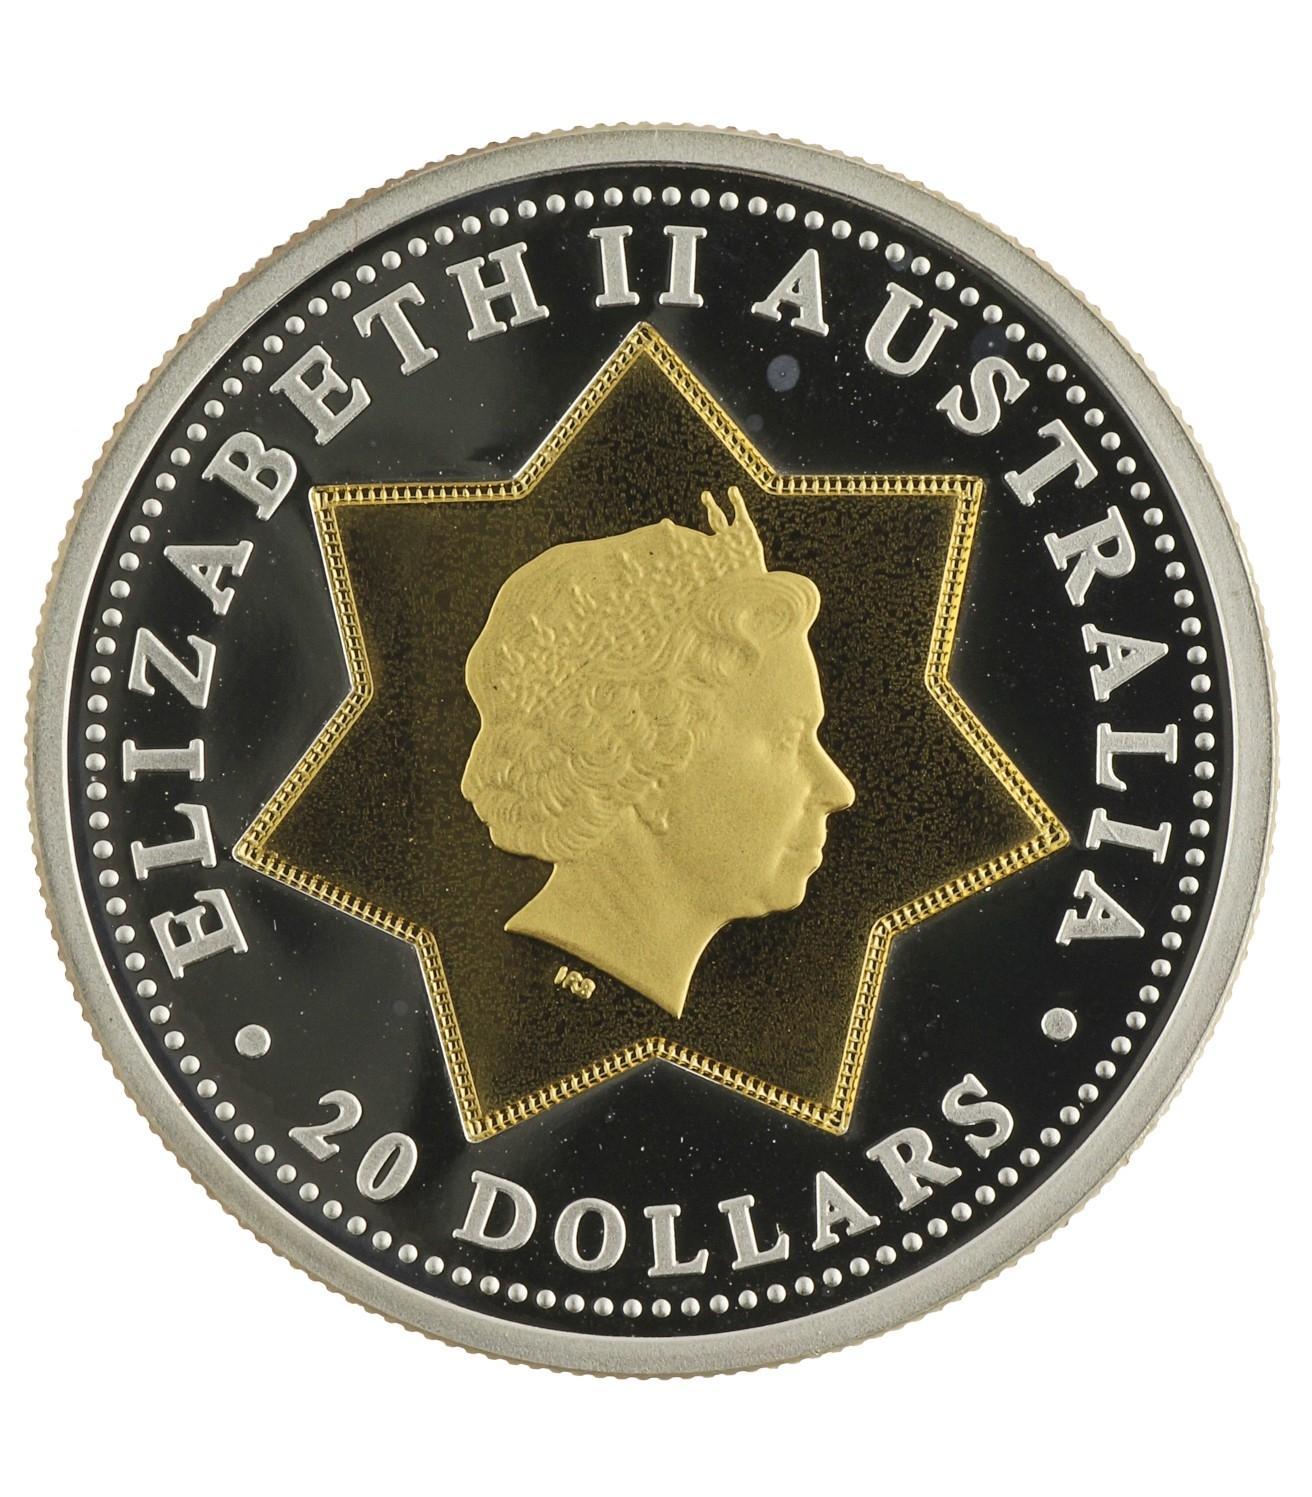 20 Dollars - Australia - 2001